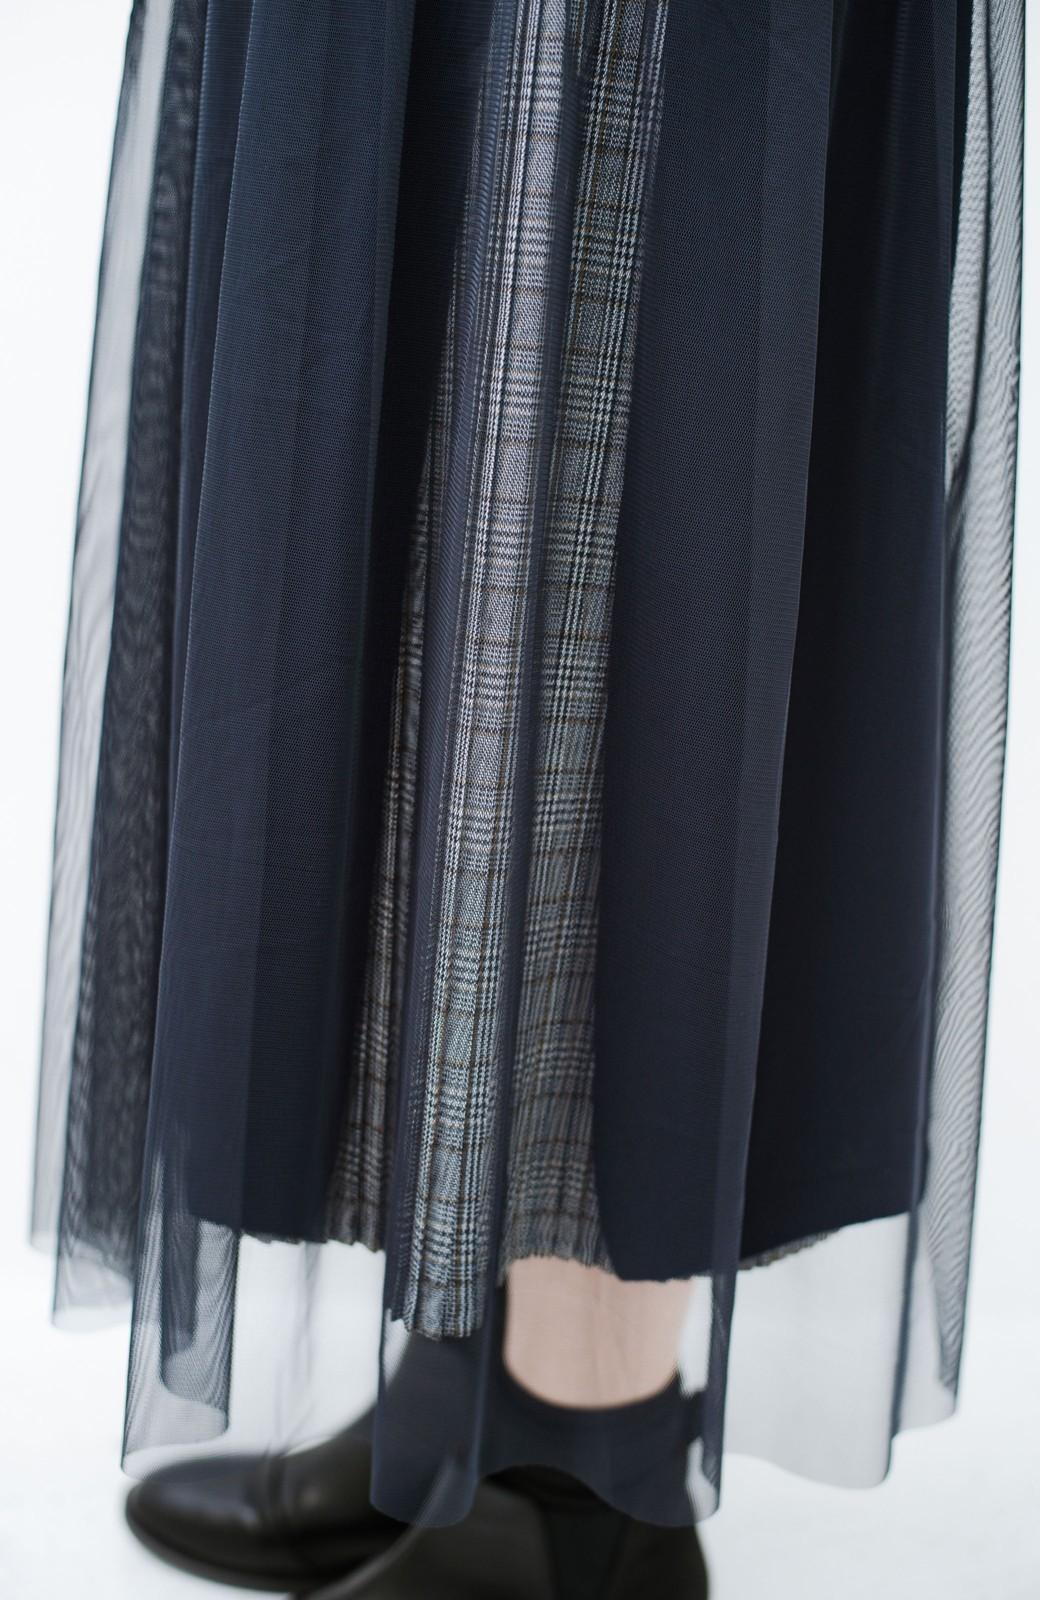 haco! 着こなし無限!自由自在なスリットロングニットとチェックプリーツスカートとチュール巻きスカートの3点セット <ネイビー>の商品写真7